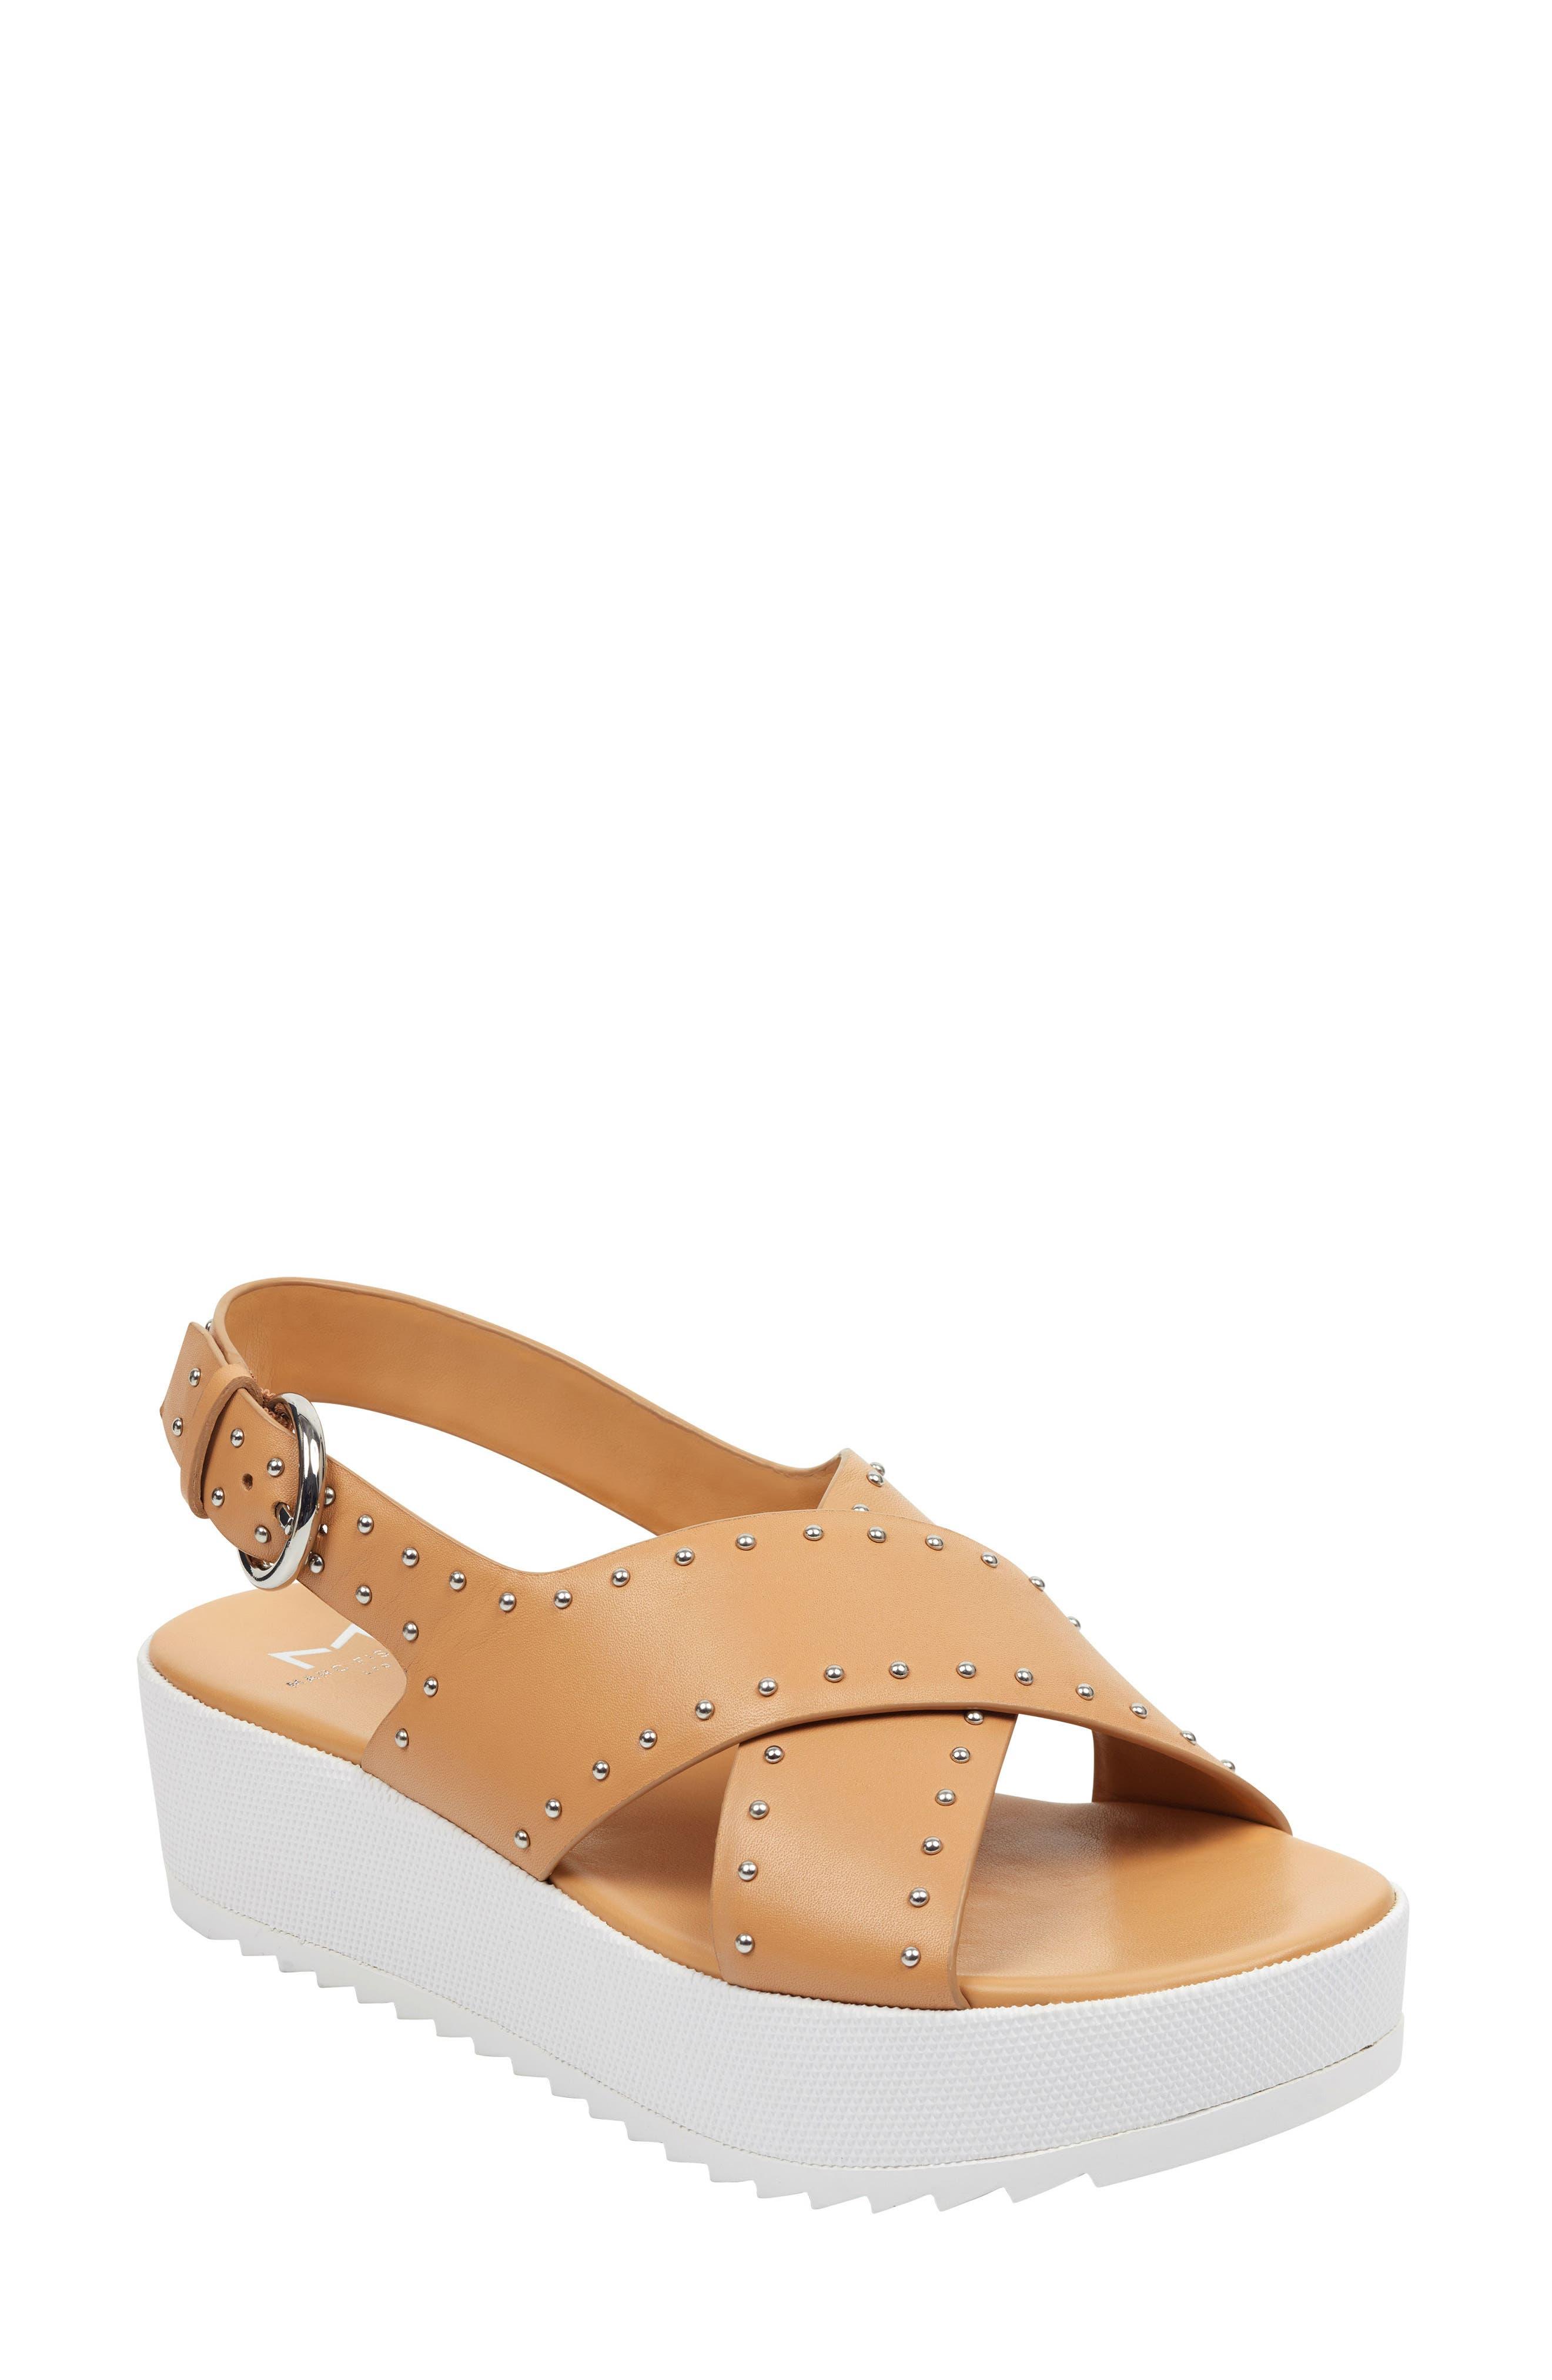 Marc Fisher Ltd Delilah Slingback Sandal, Brown